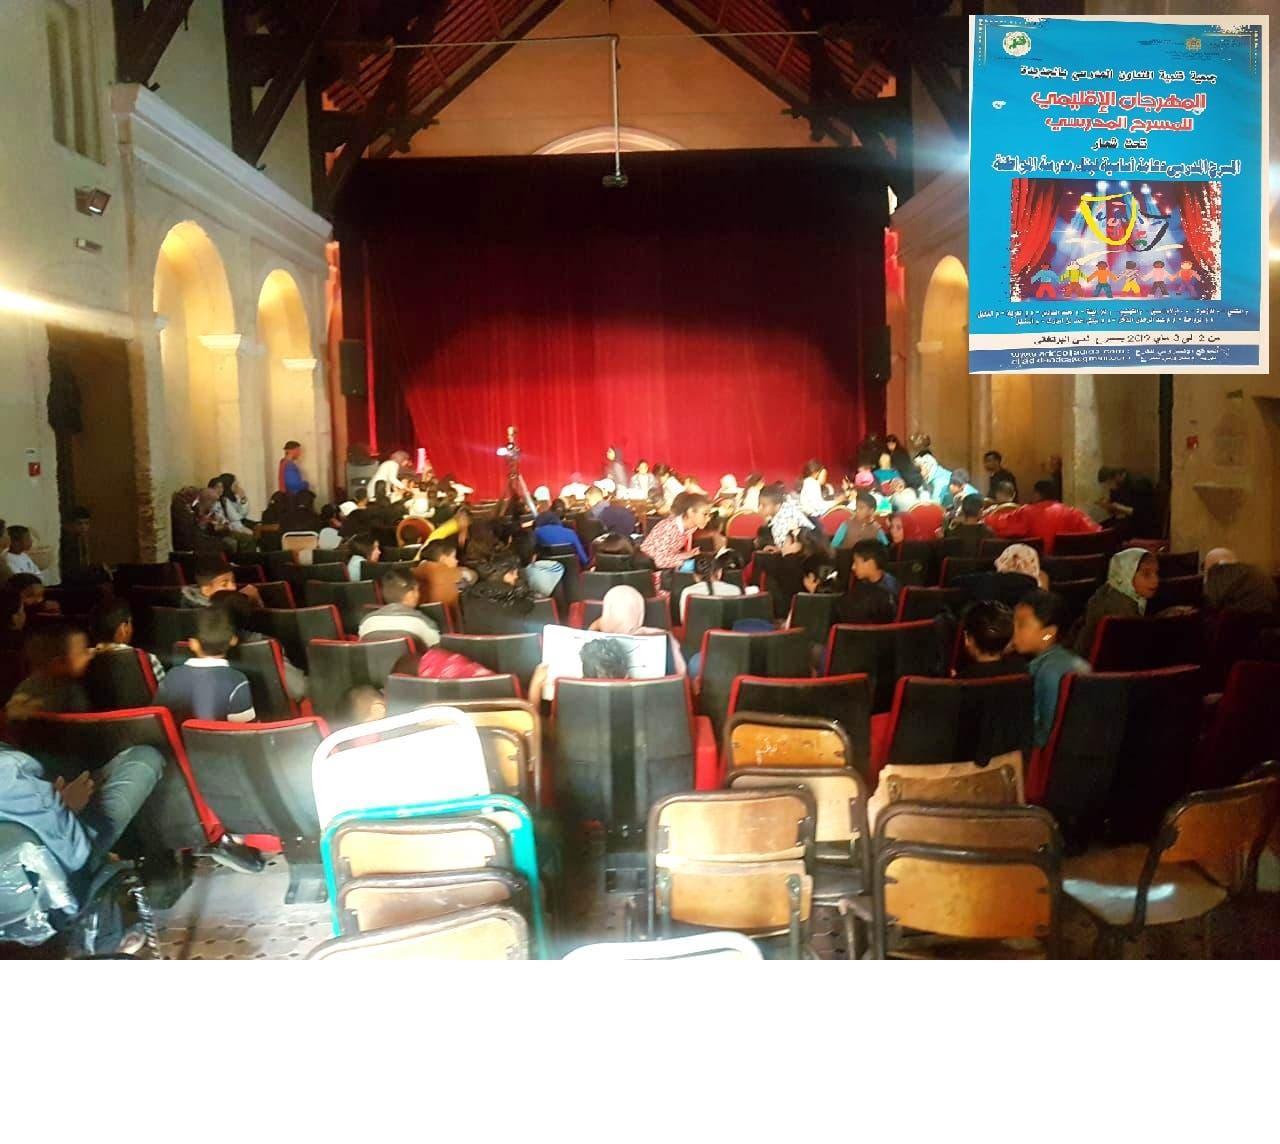 Photo of الجديدة: المسرح المدرسي دعامة لبناء مدرسة المواطنة